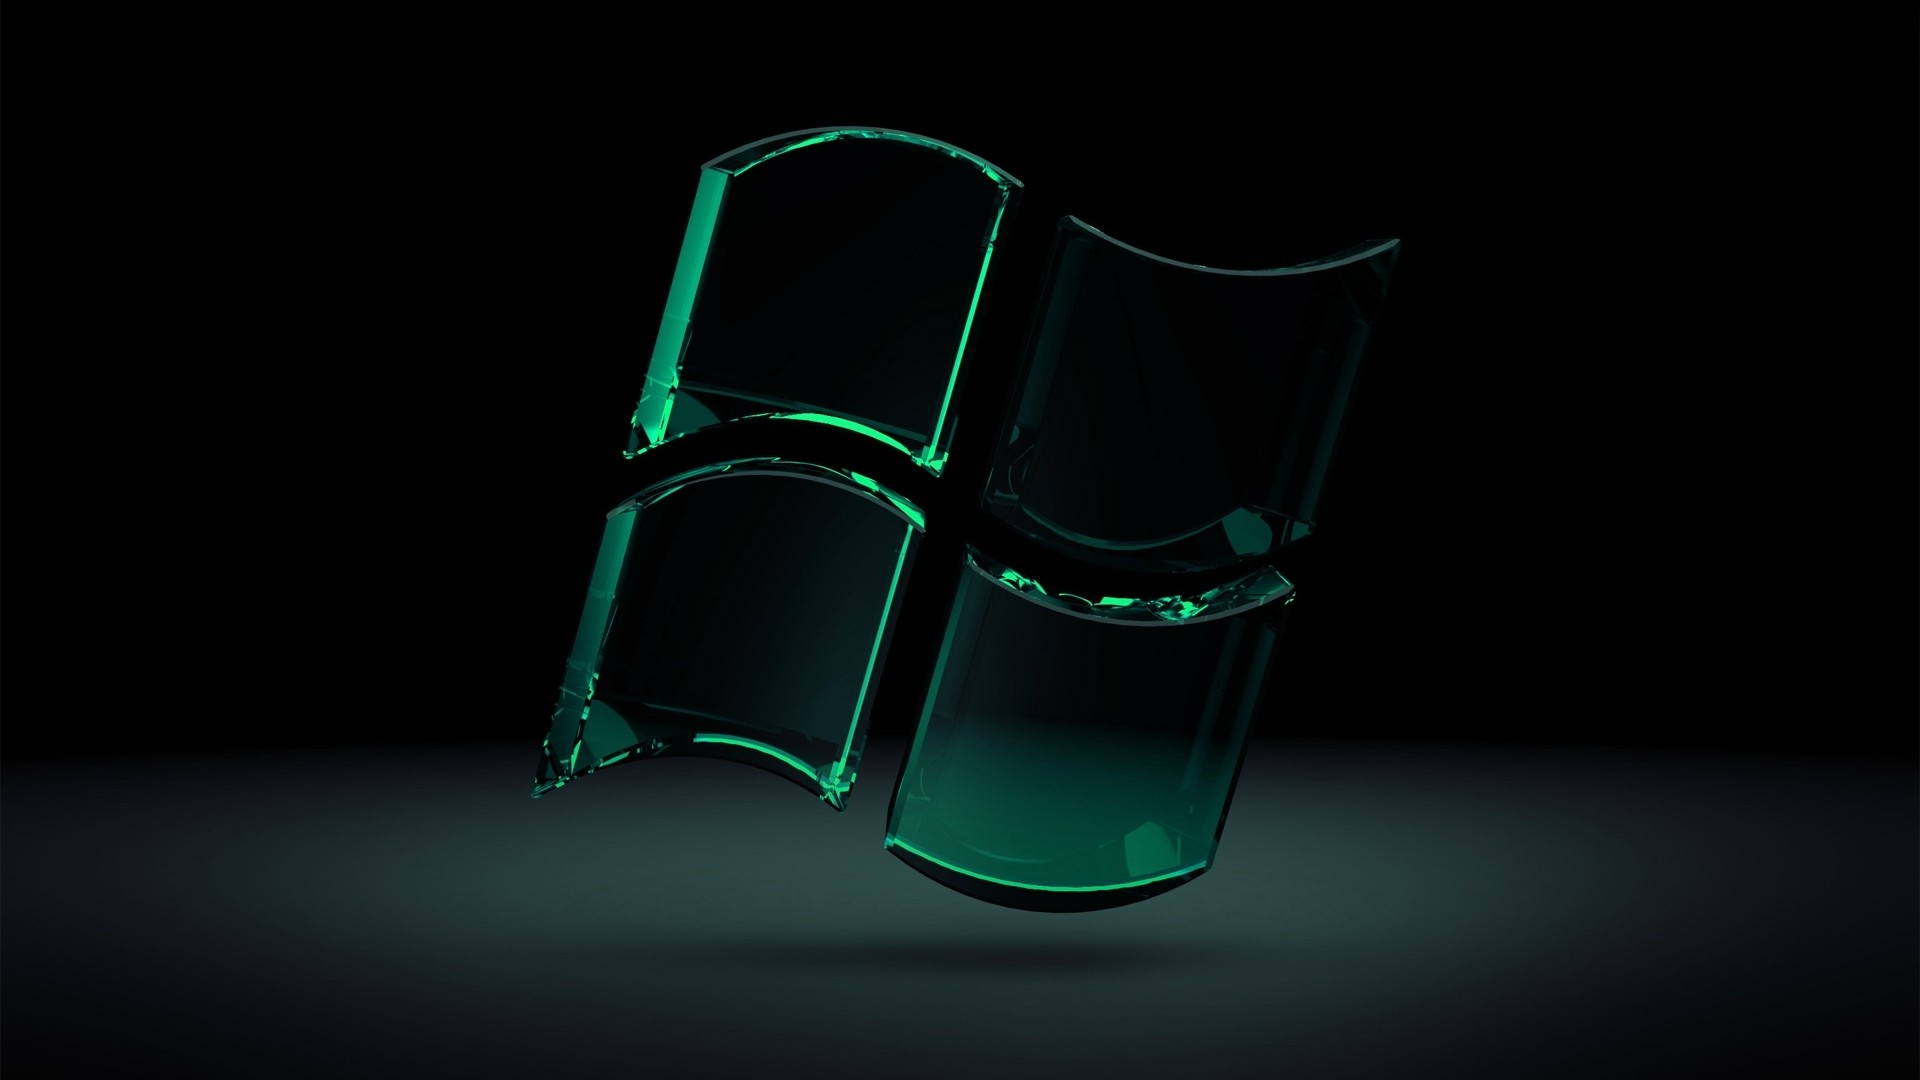 Preview wallpaper windows, green, black, glass 1920×1080